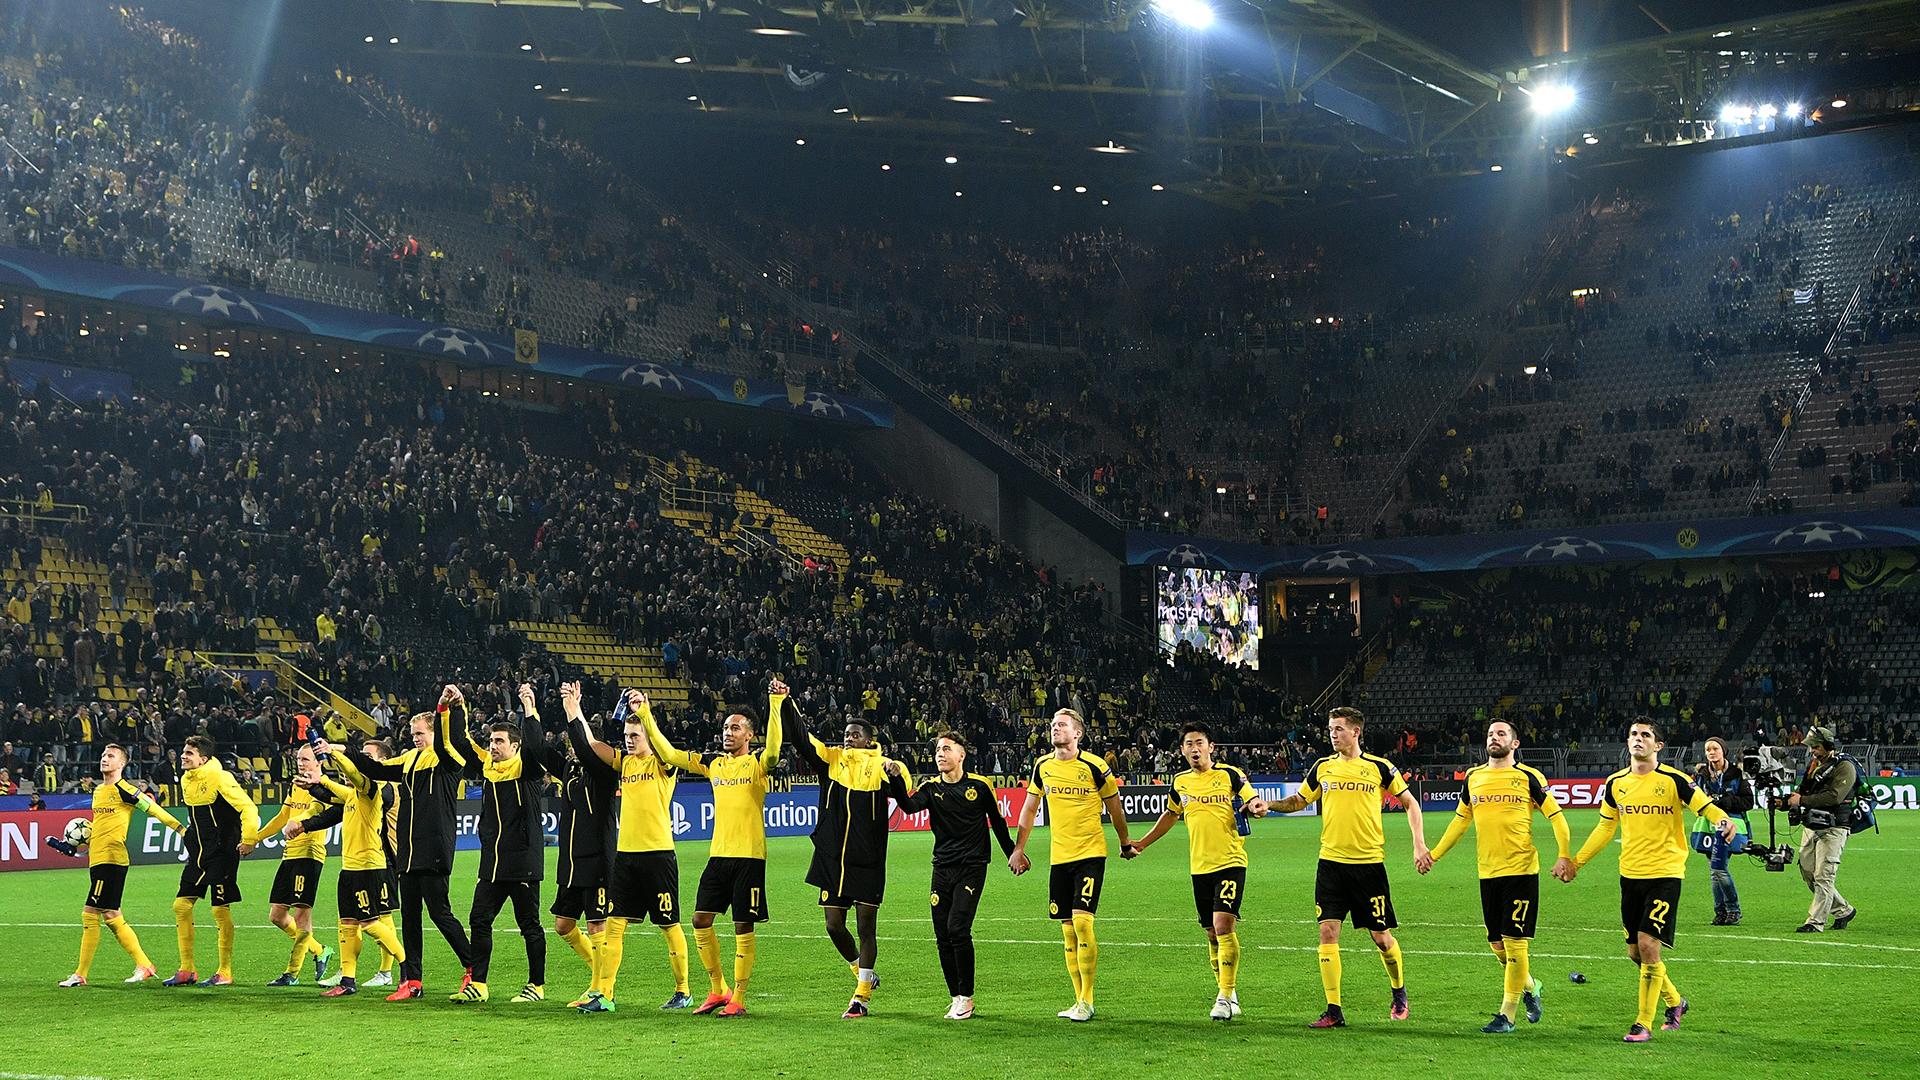 Borussia Dortmund Champions League